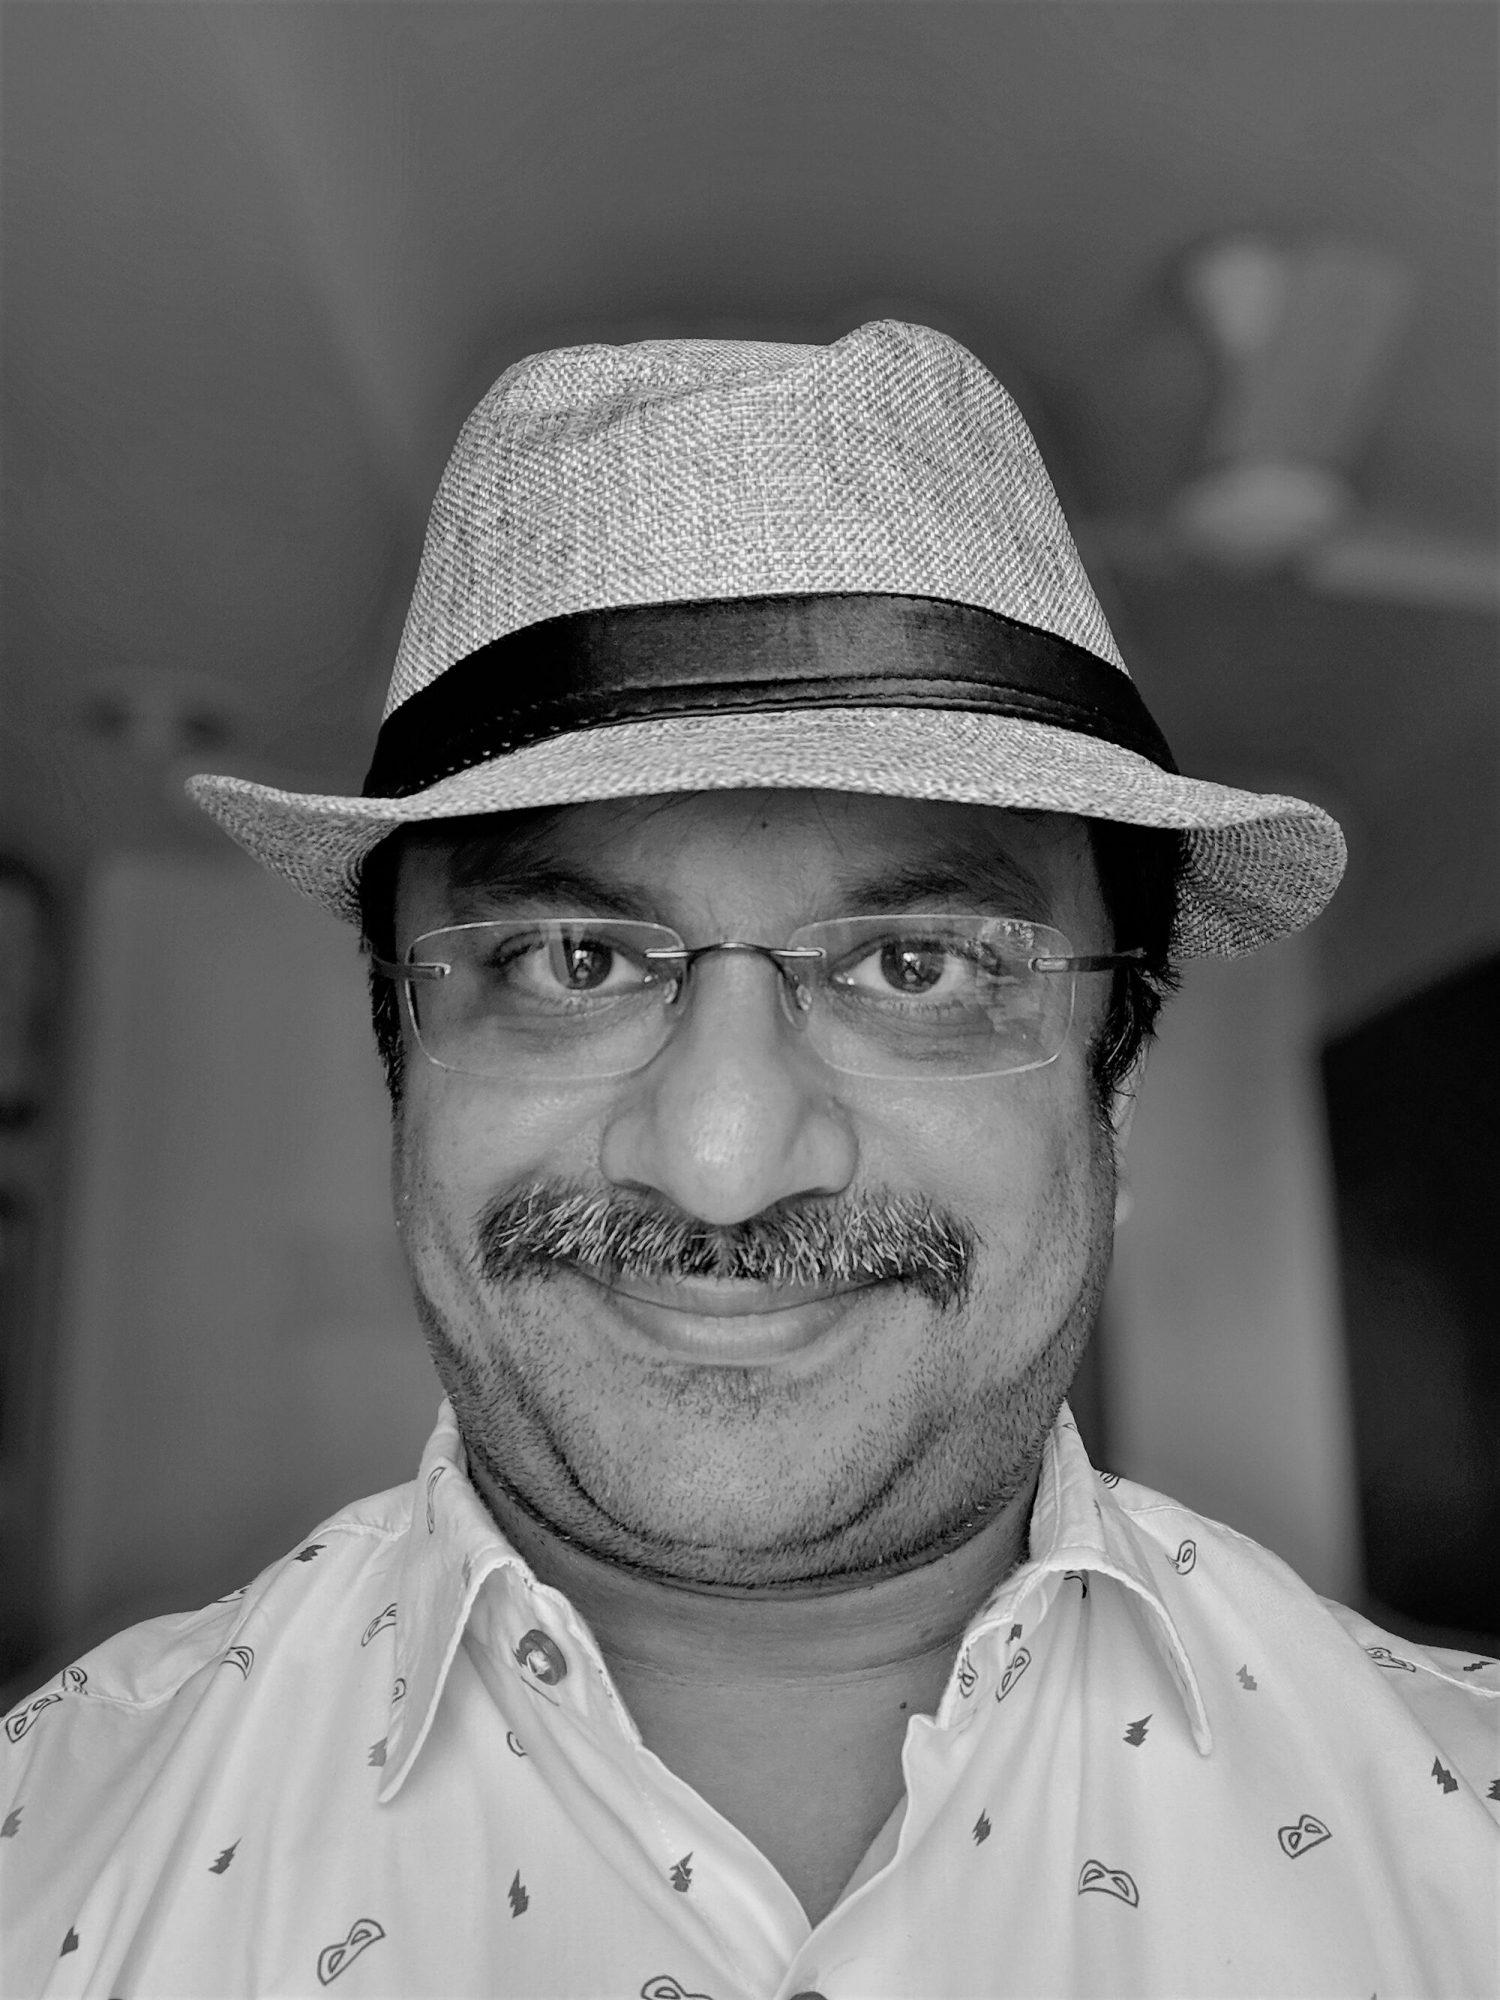 Venkatarangan with a fedora hat